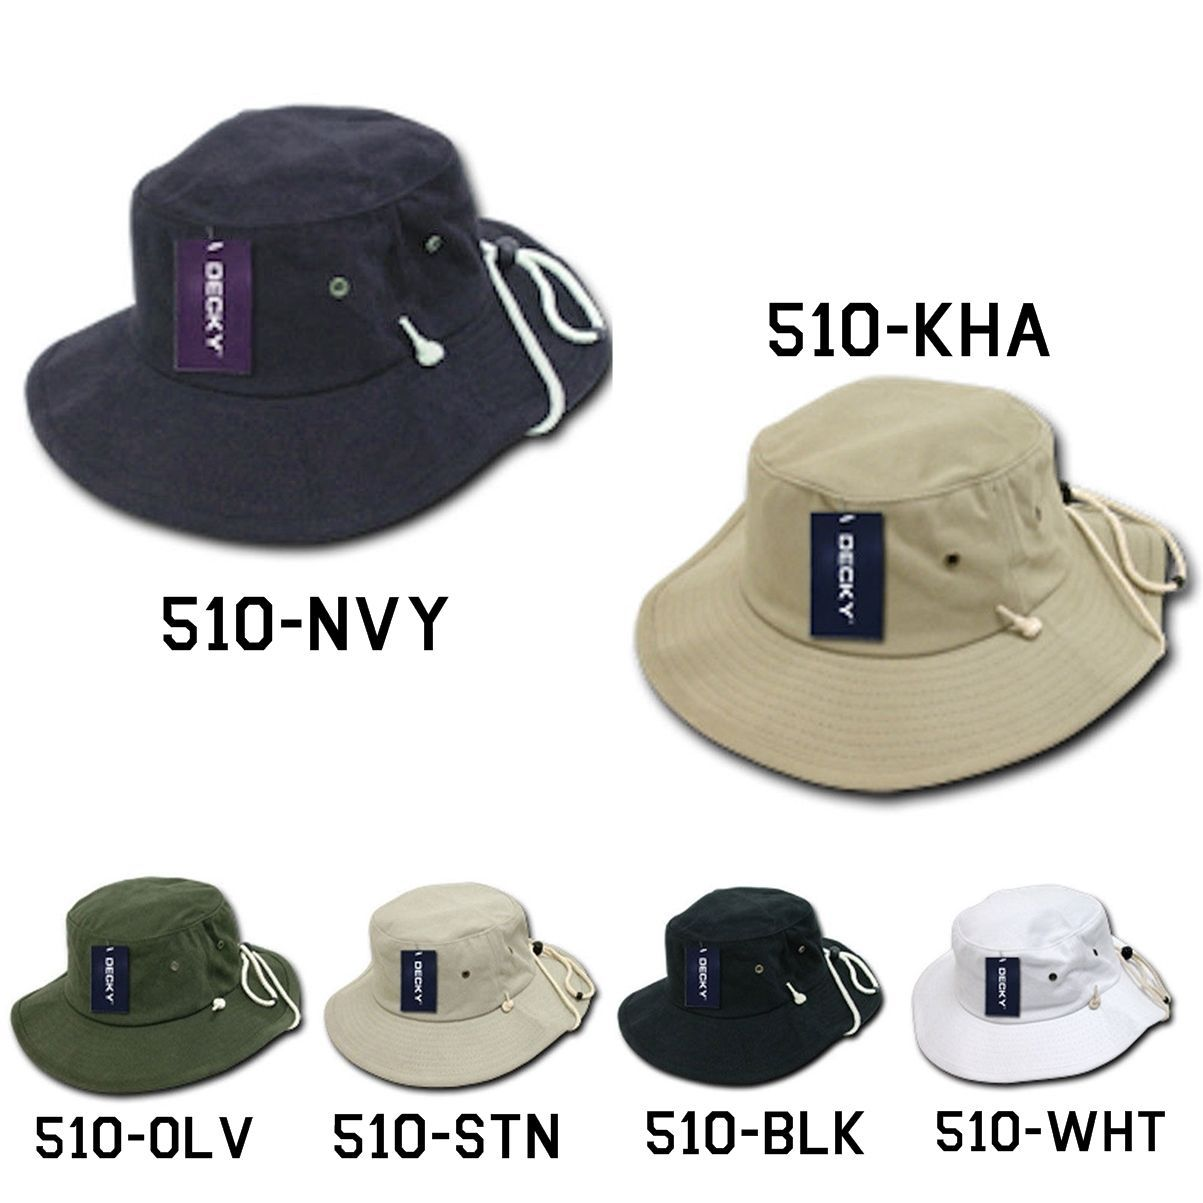 CUSTOM EMBROIDERY Personalized Customized Decky Australian Bucket Hat Hats 510